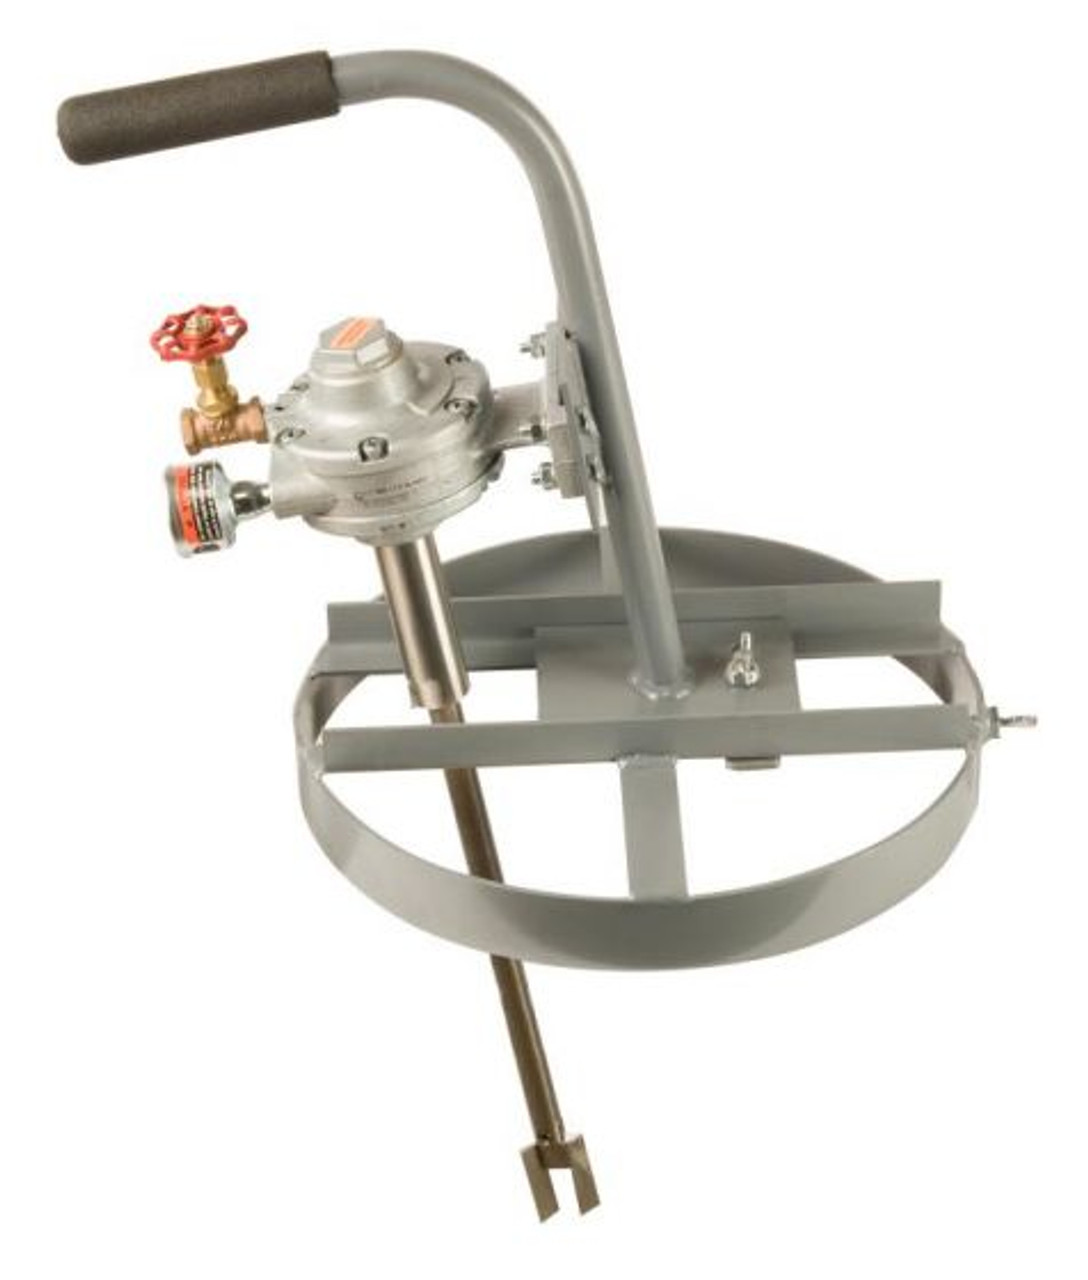 Pail Mixer - 3/4 HP Air Motor